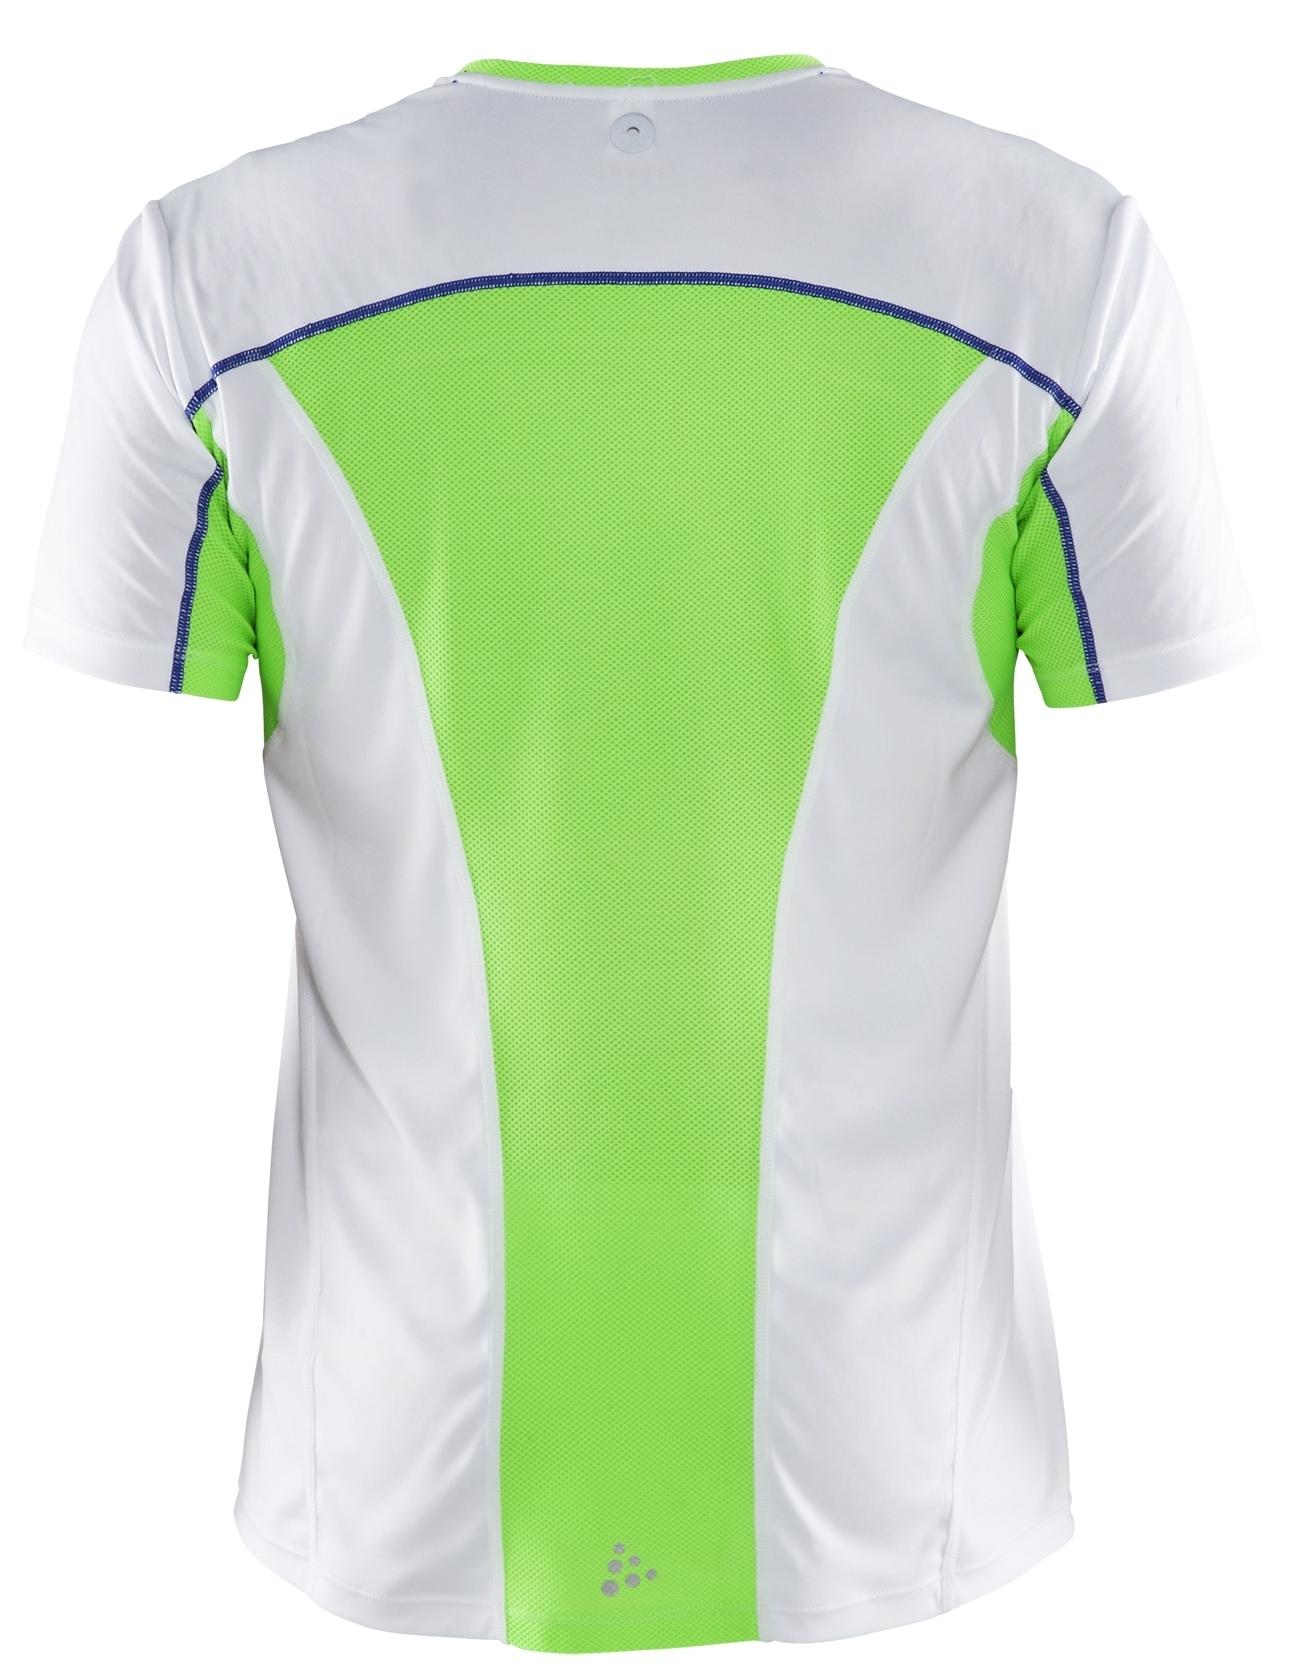 Мужская футболка для бега Craft Performance (1902488-2900) белая